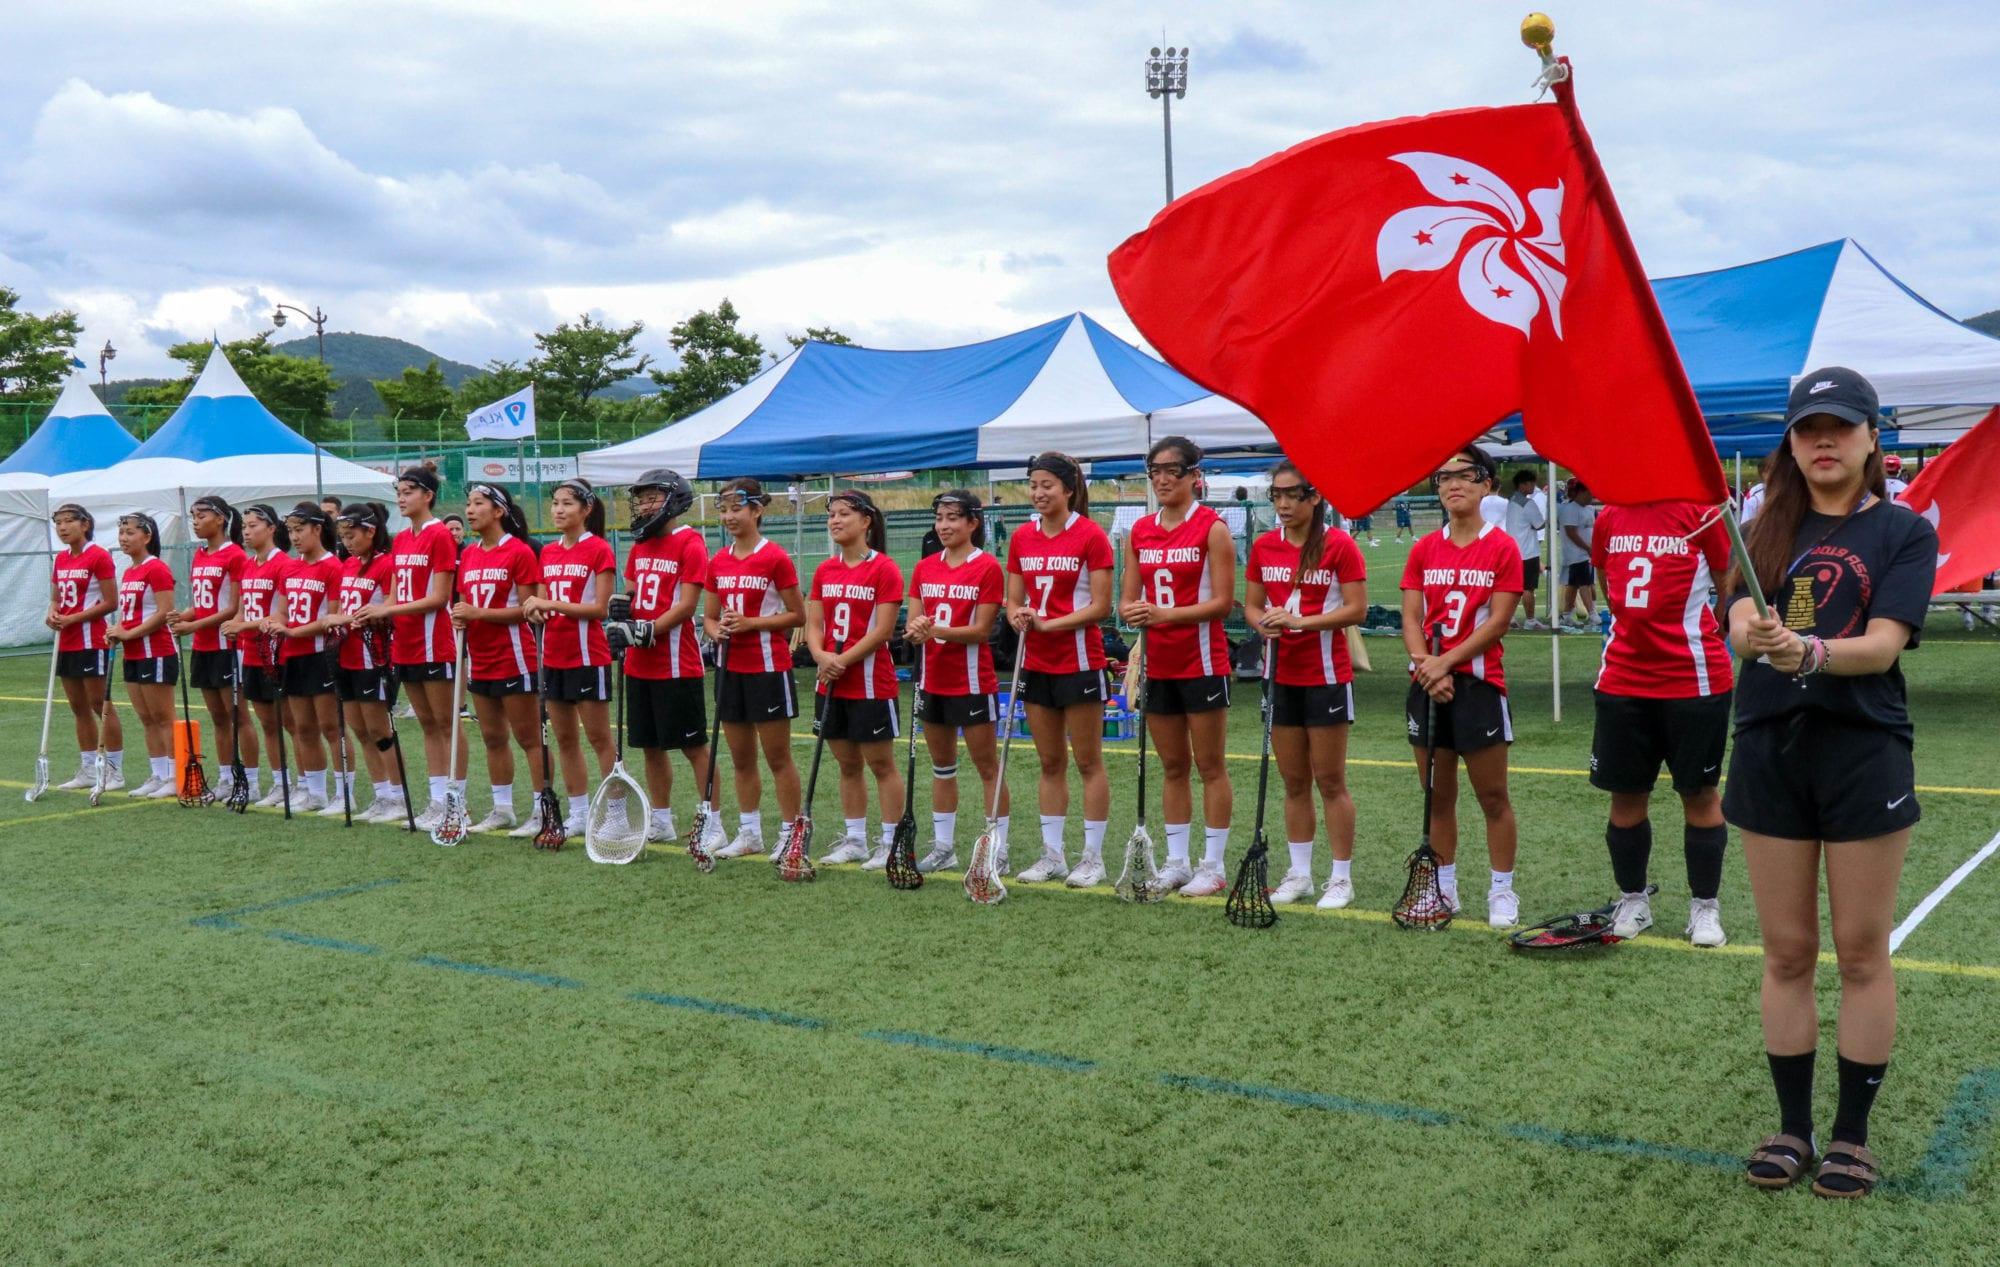 hong kong women's lacrosse